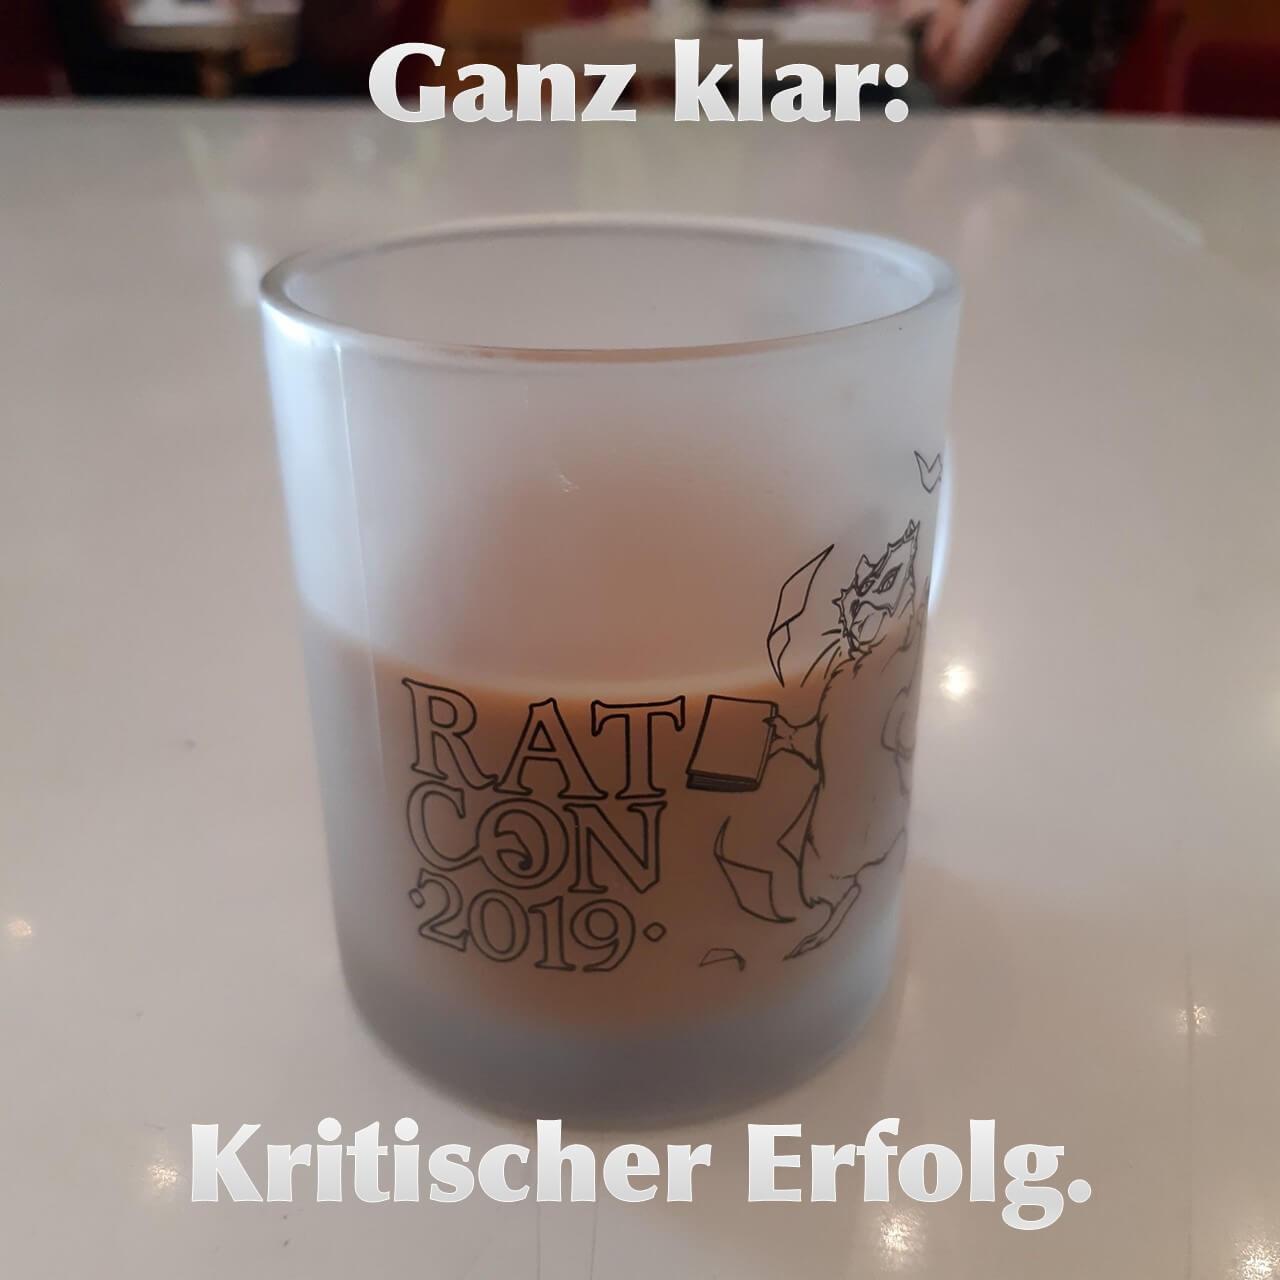 Ratcon Limburg 2019 Kaffee Tasse